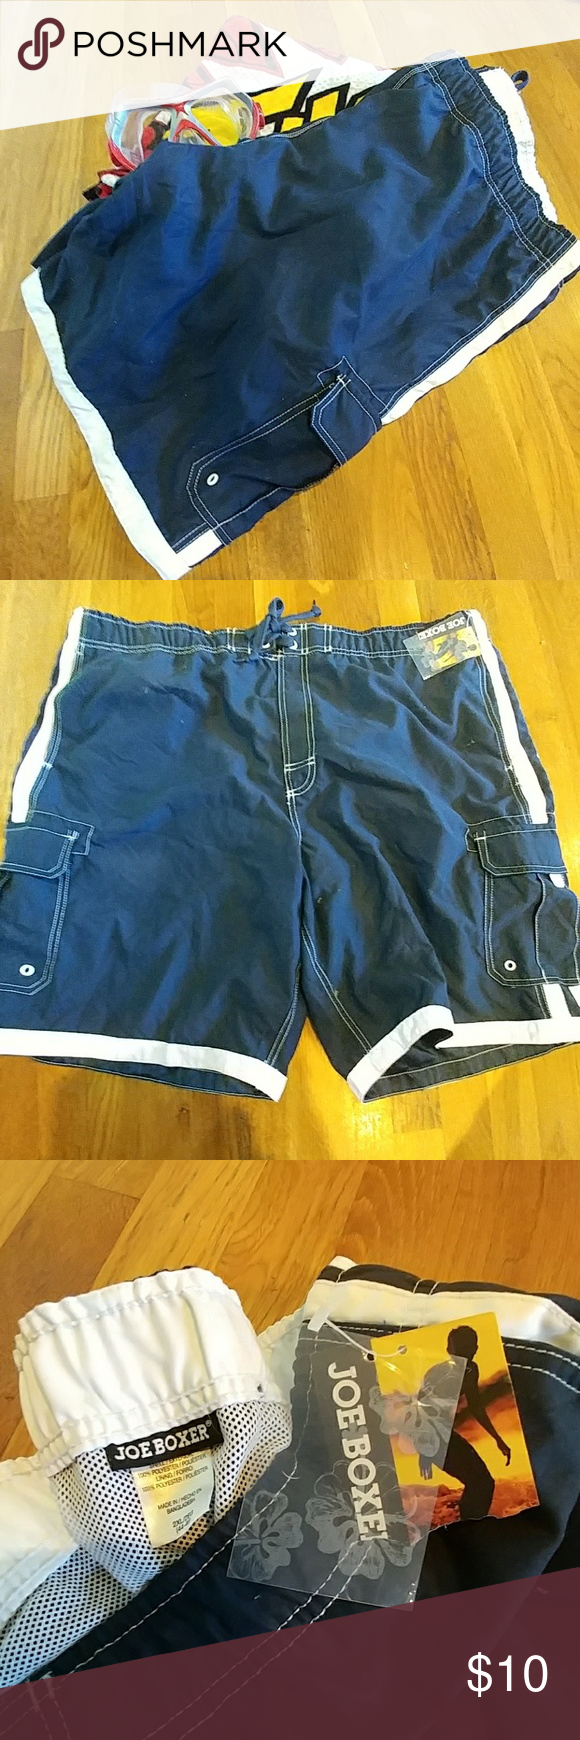 c305f4f44d JOE BOXER NWT XXL Men's swim trunks Joe Boxer men's swim trunks, color is  navy with white accent stripes, size is 2XL, pockets on both legs 6 items  for $25.